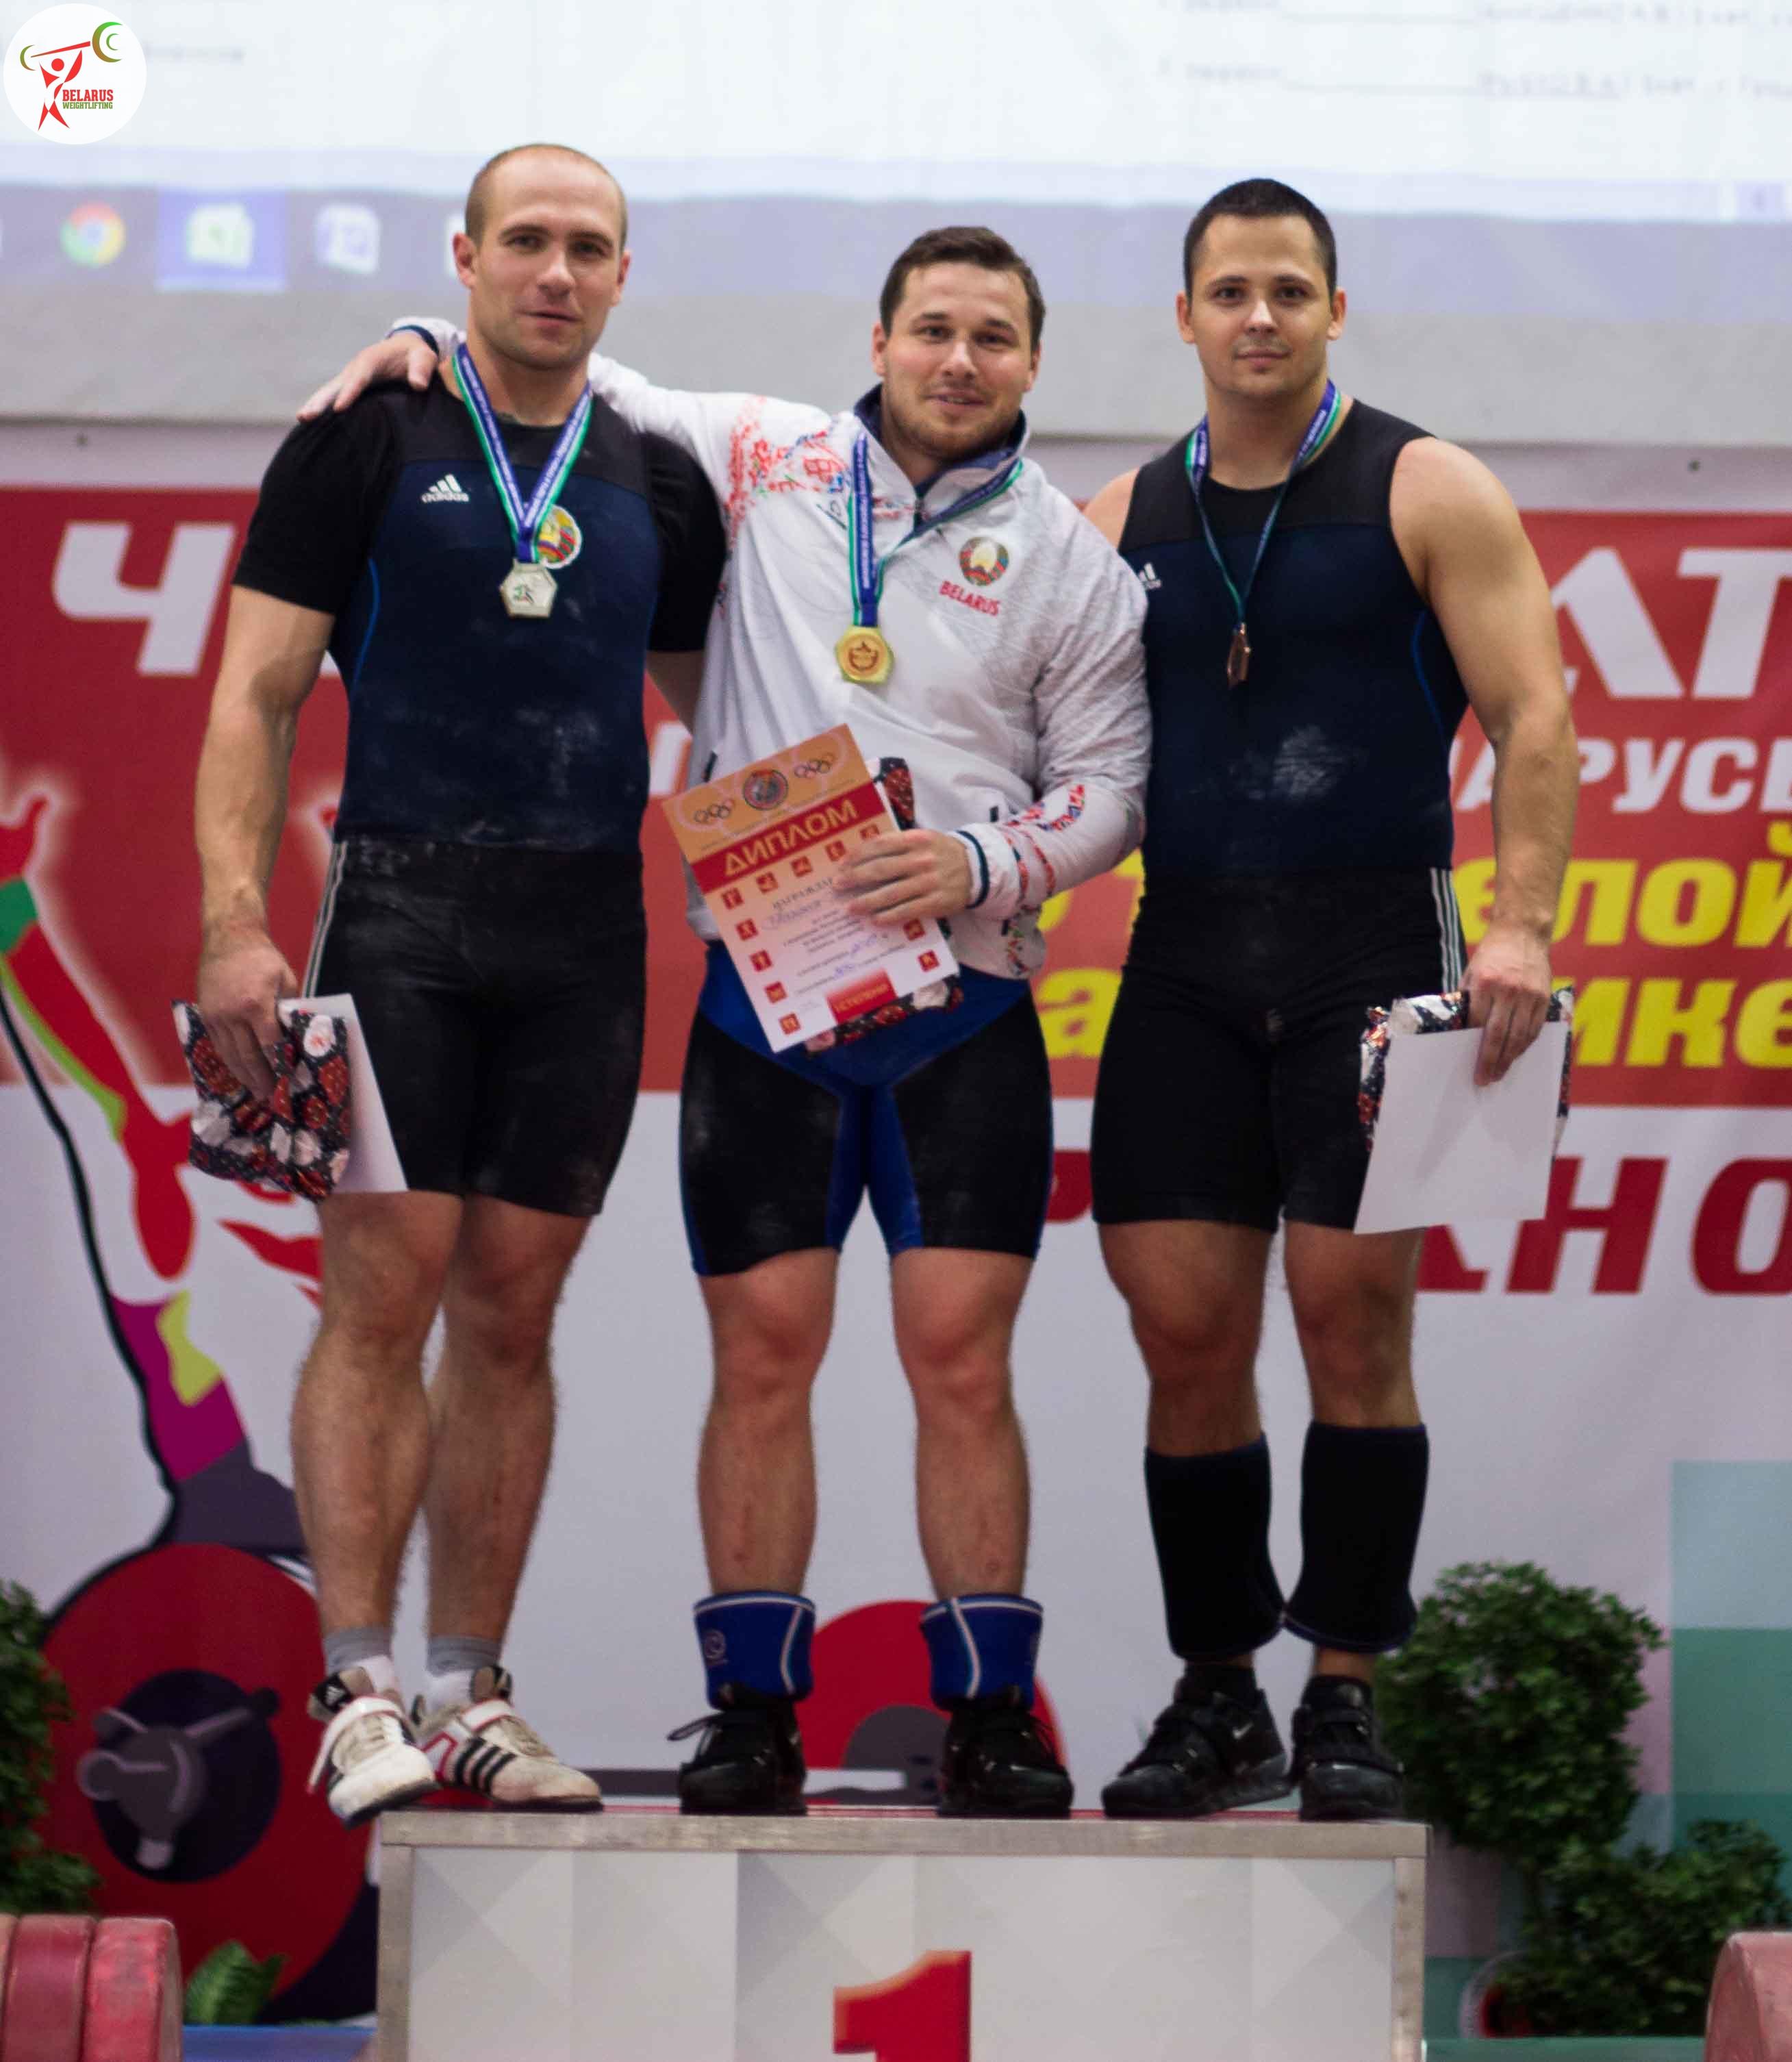 Alexander Bersanov, Peter Asaonok, Maxim Mudrevsky